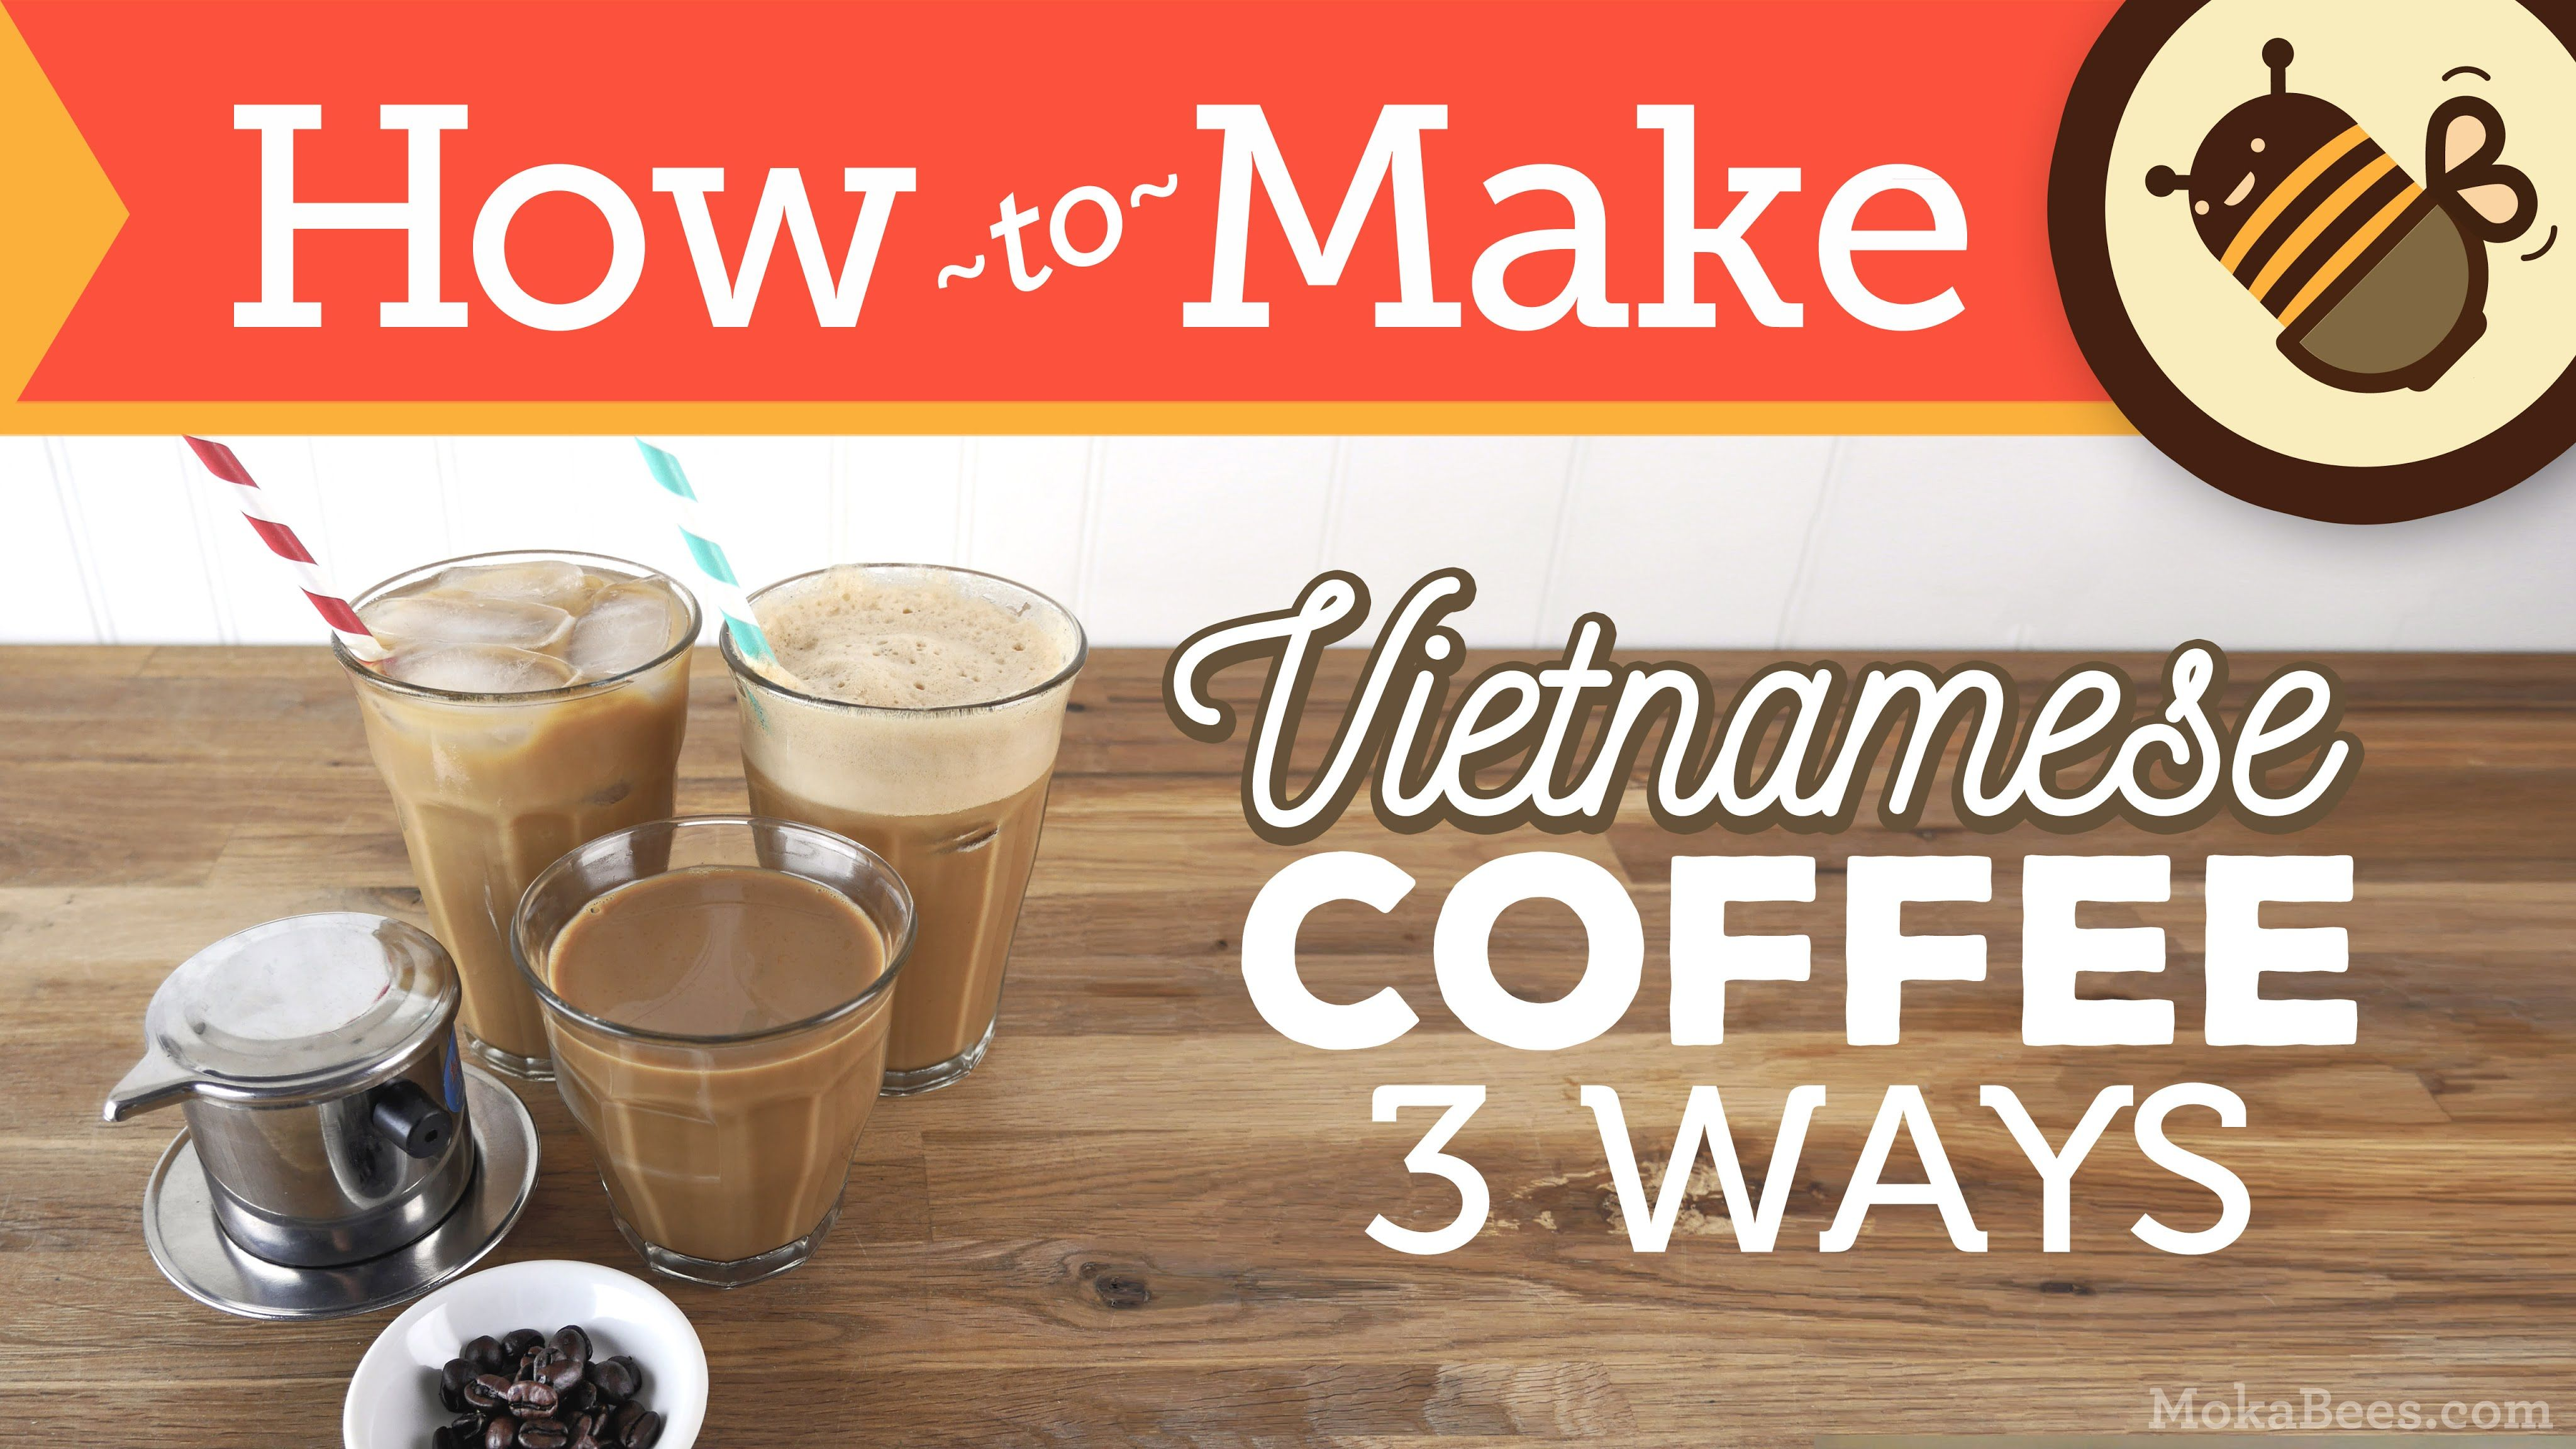 How to make vietnamese coffee 3 ways hot iced shaken